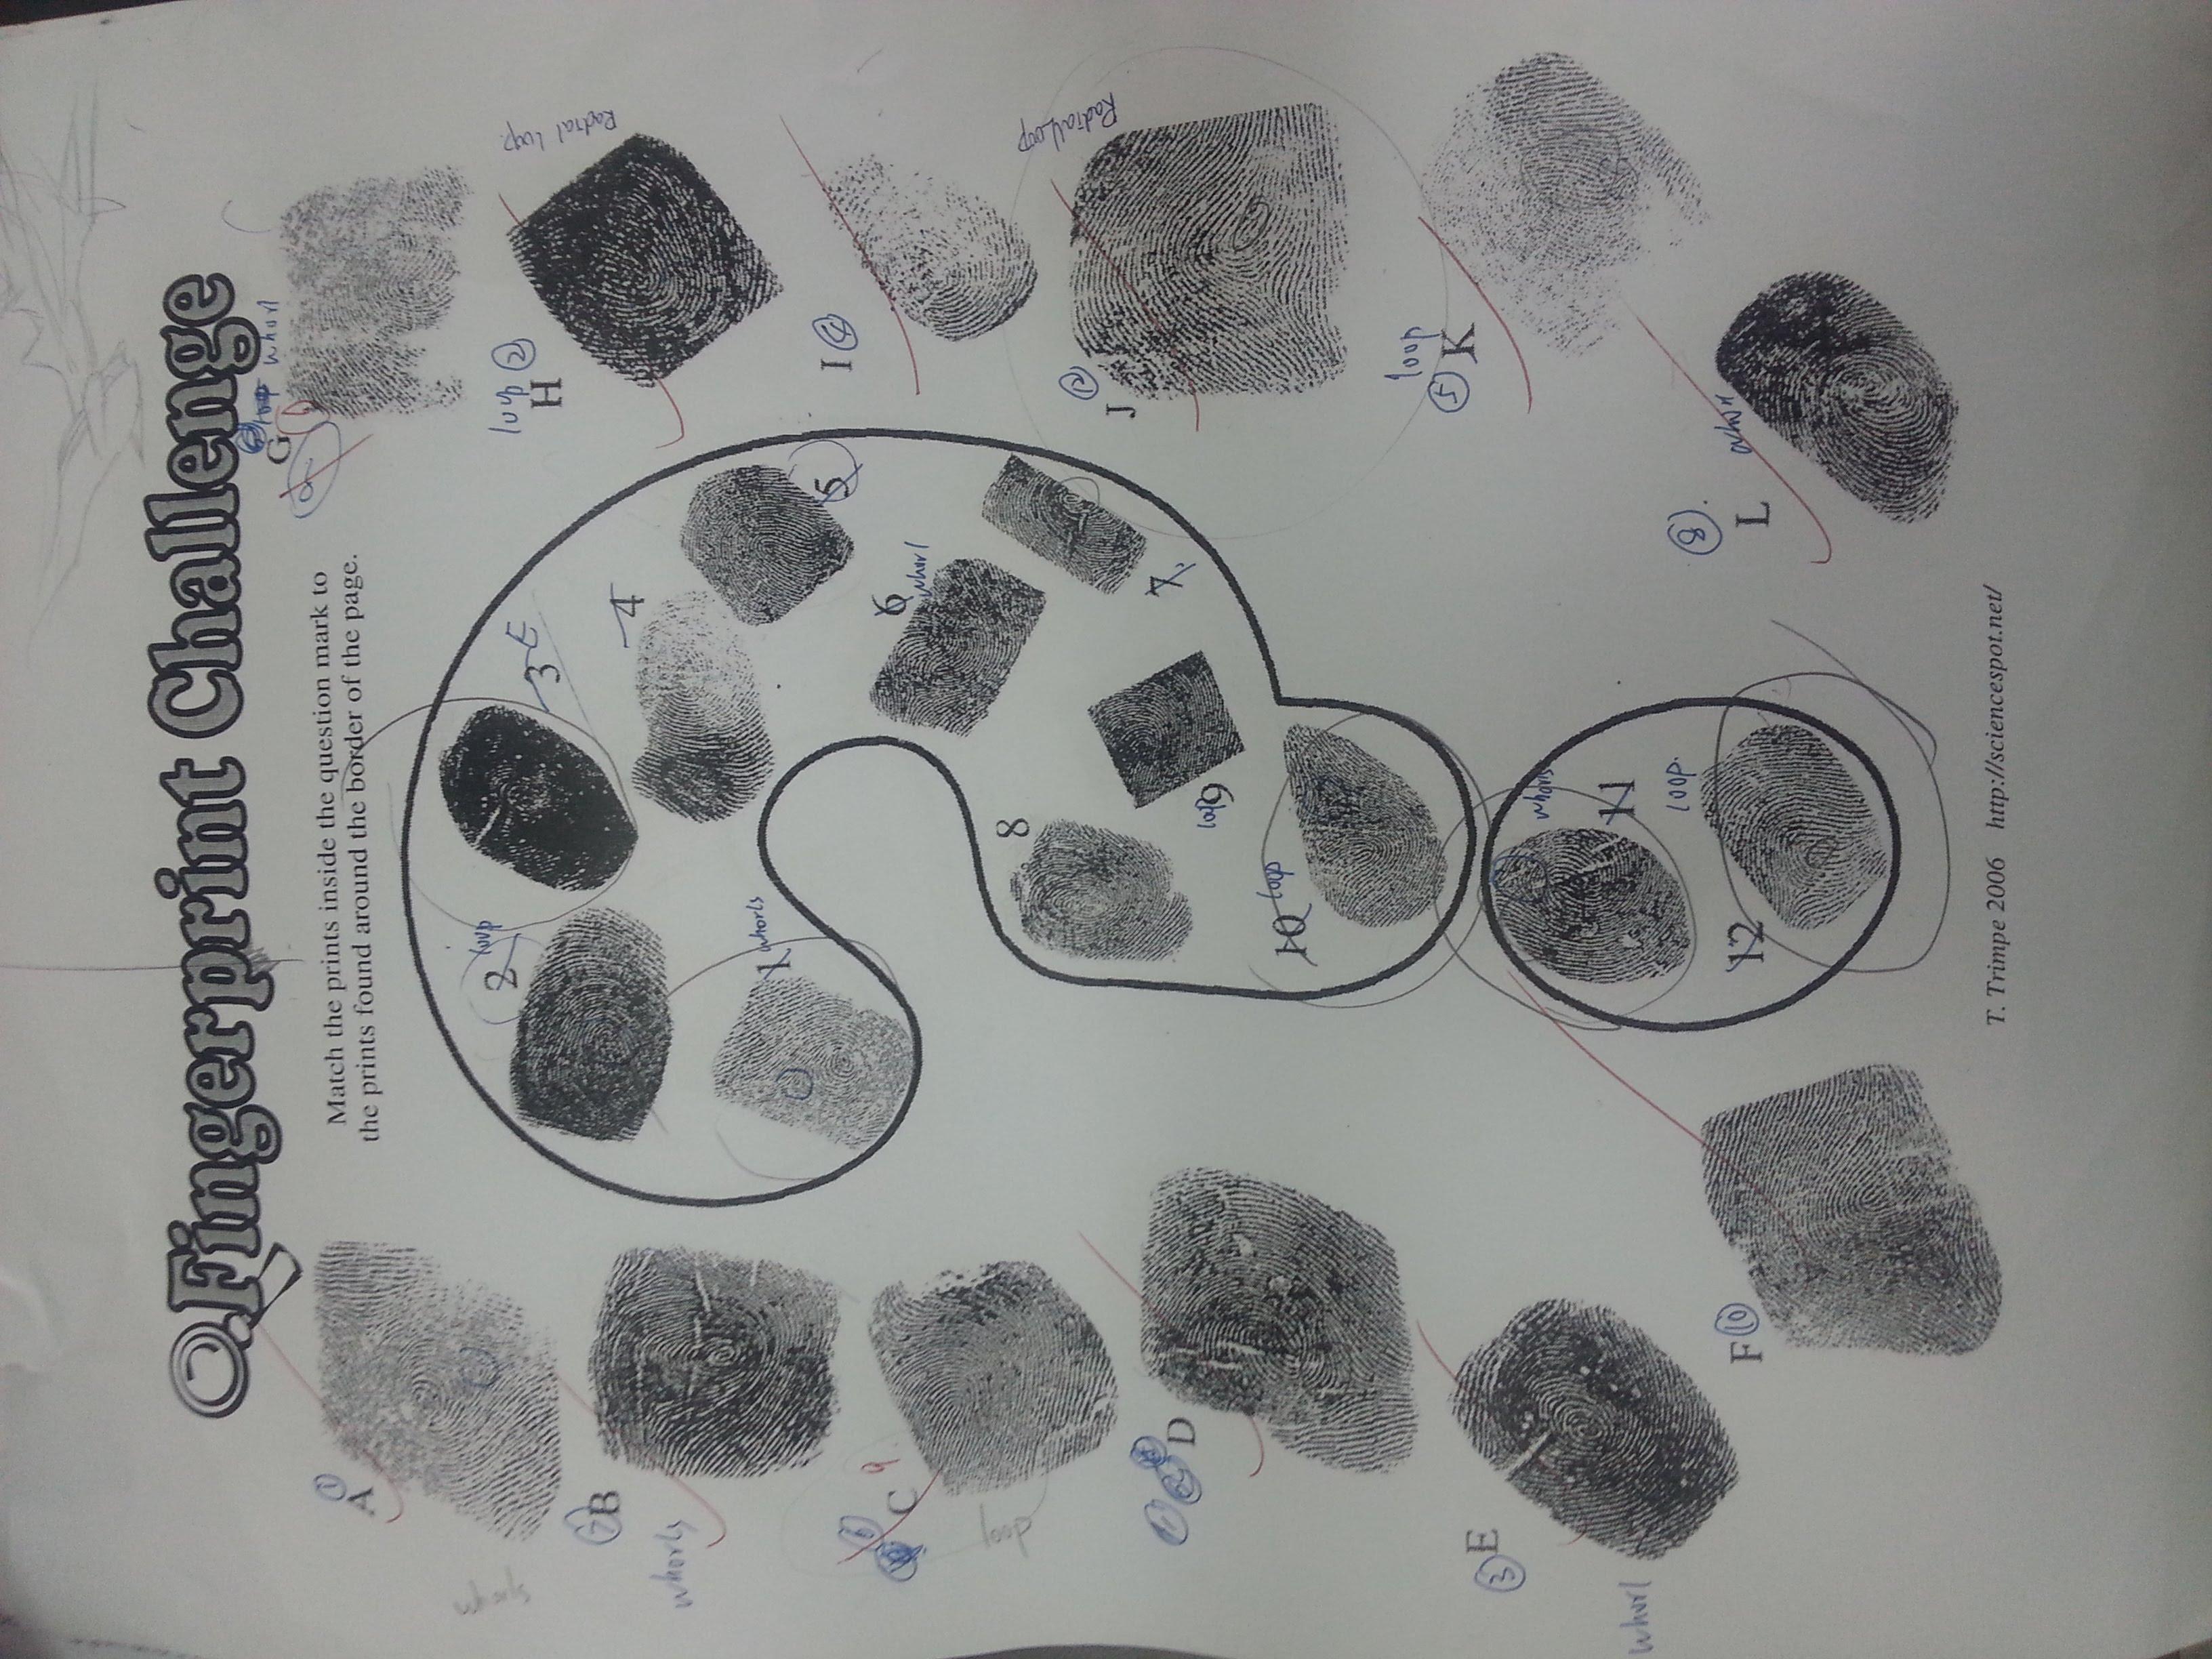 Bestseller: Answer Key Fingerprint Challenge Answers